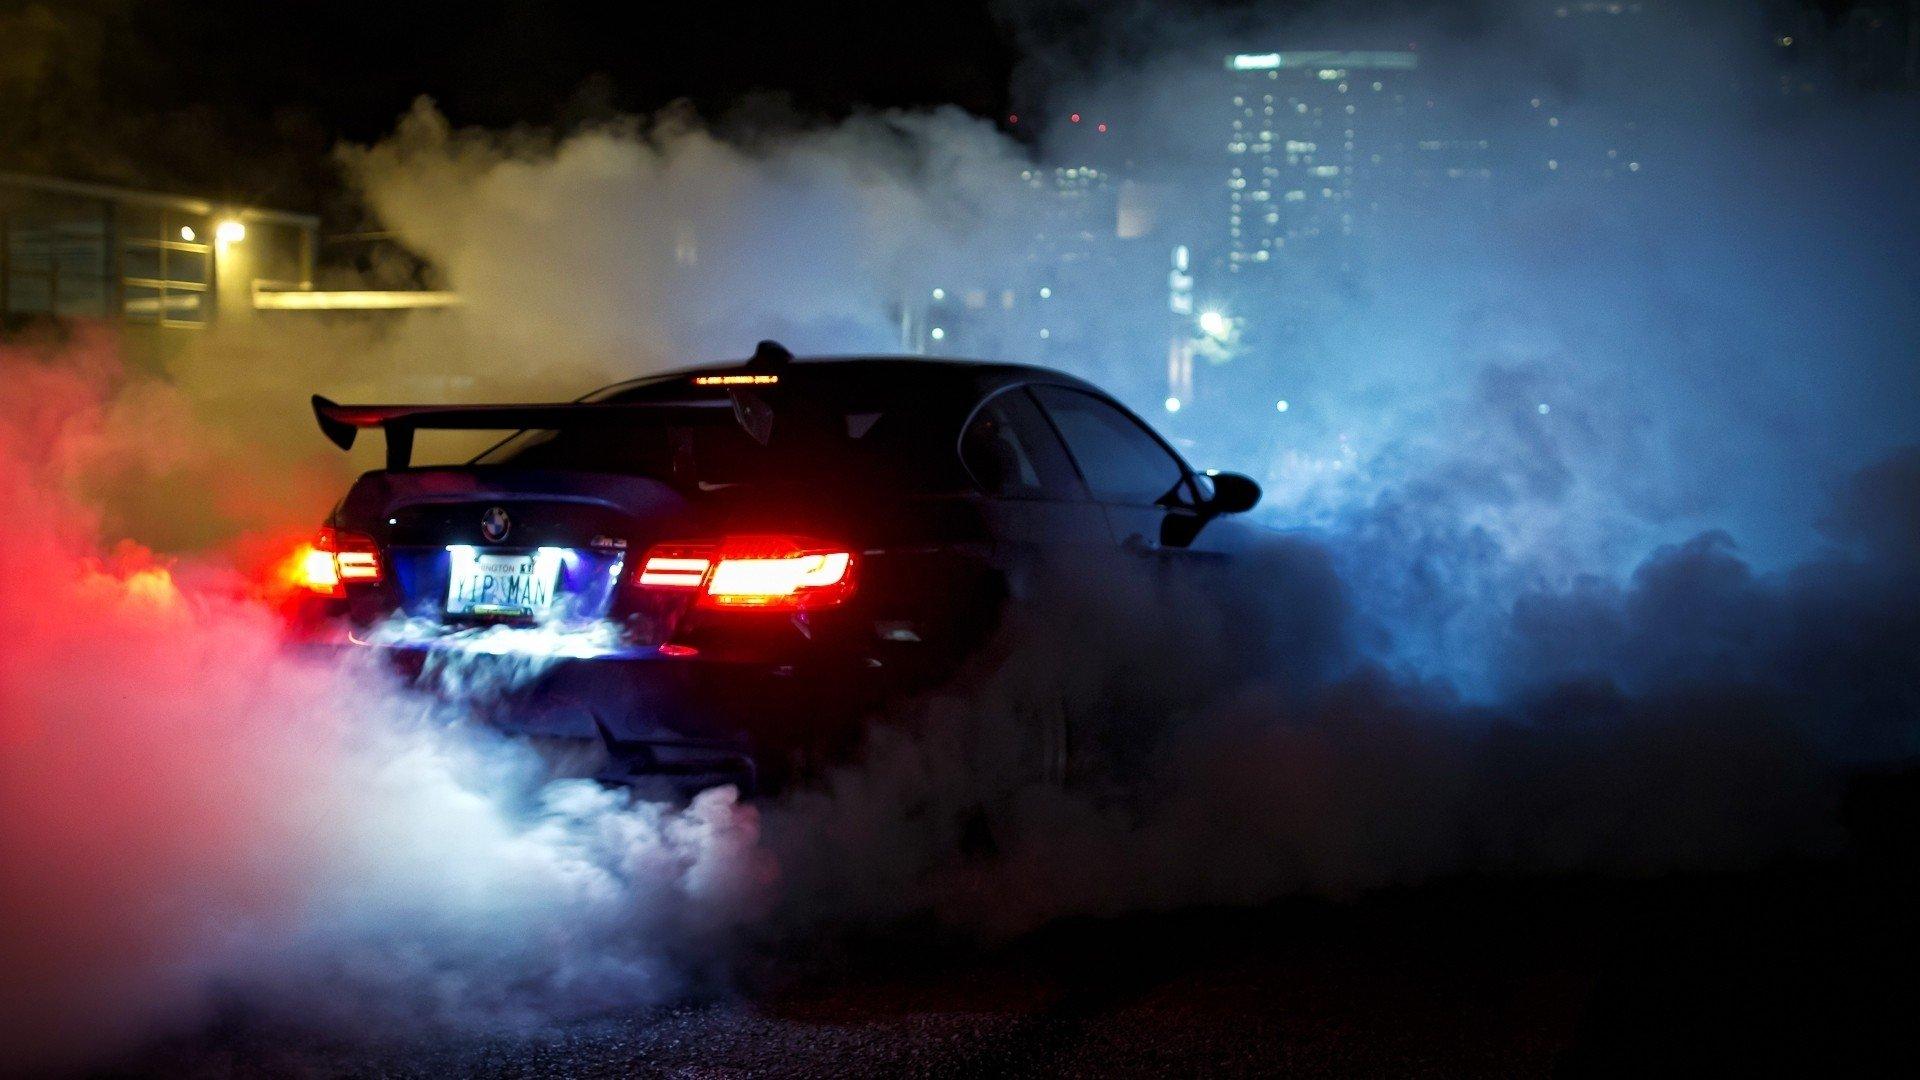 Car Fire Smoke Night Hd Wallpaper 1920x1080 237077 Wallpaperup